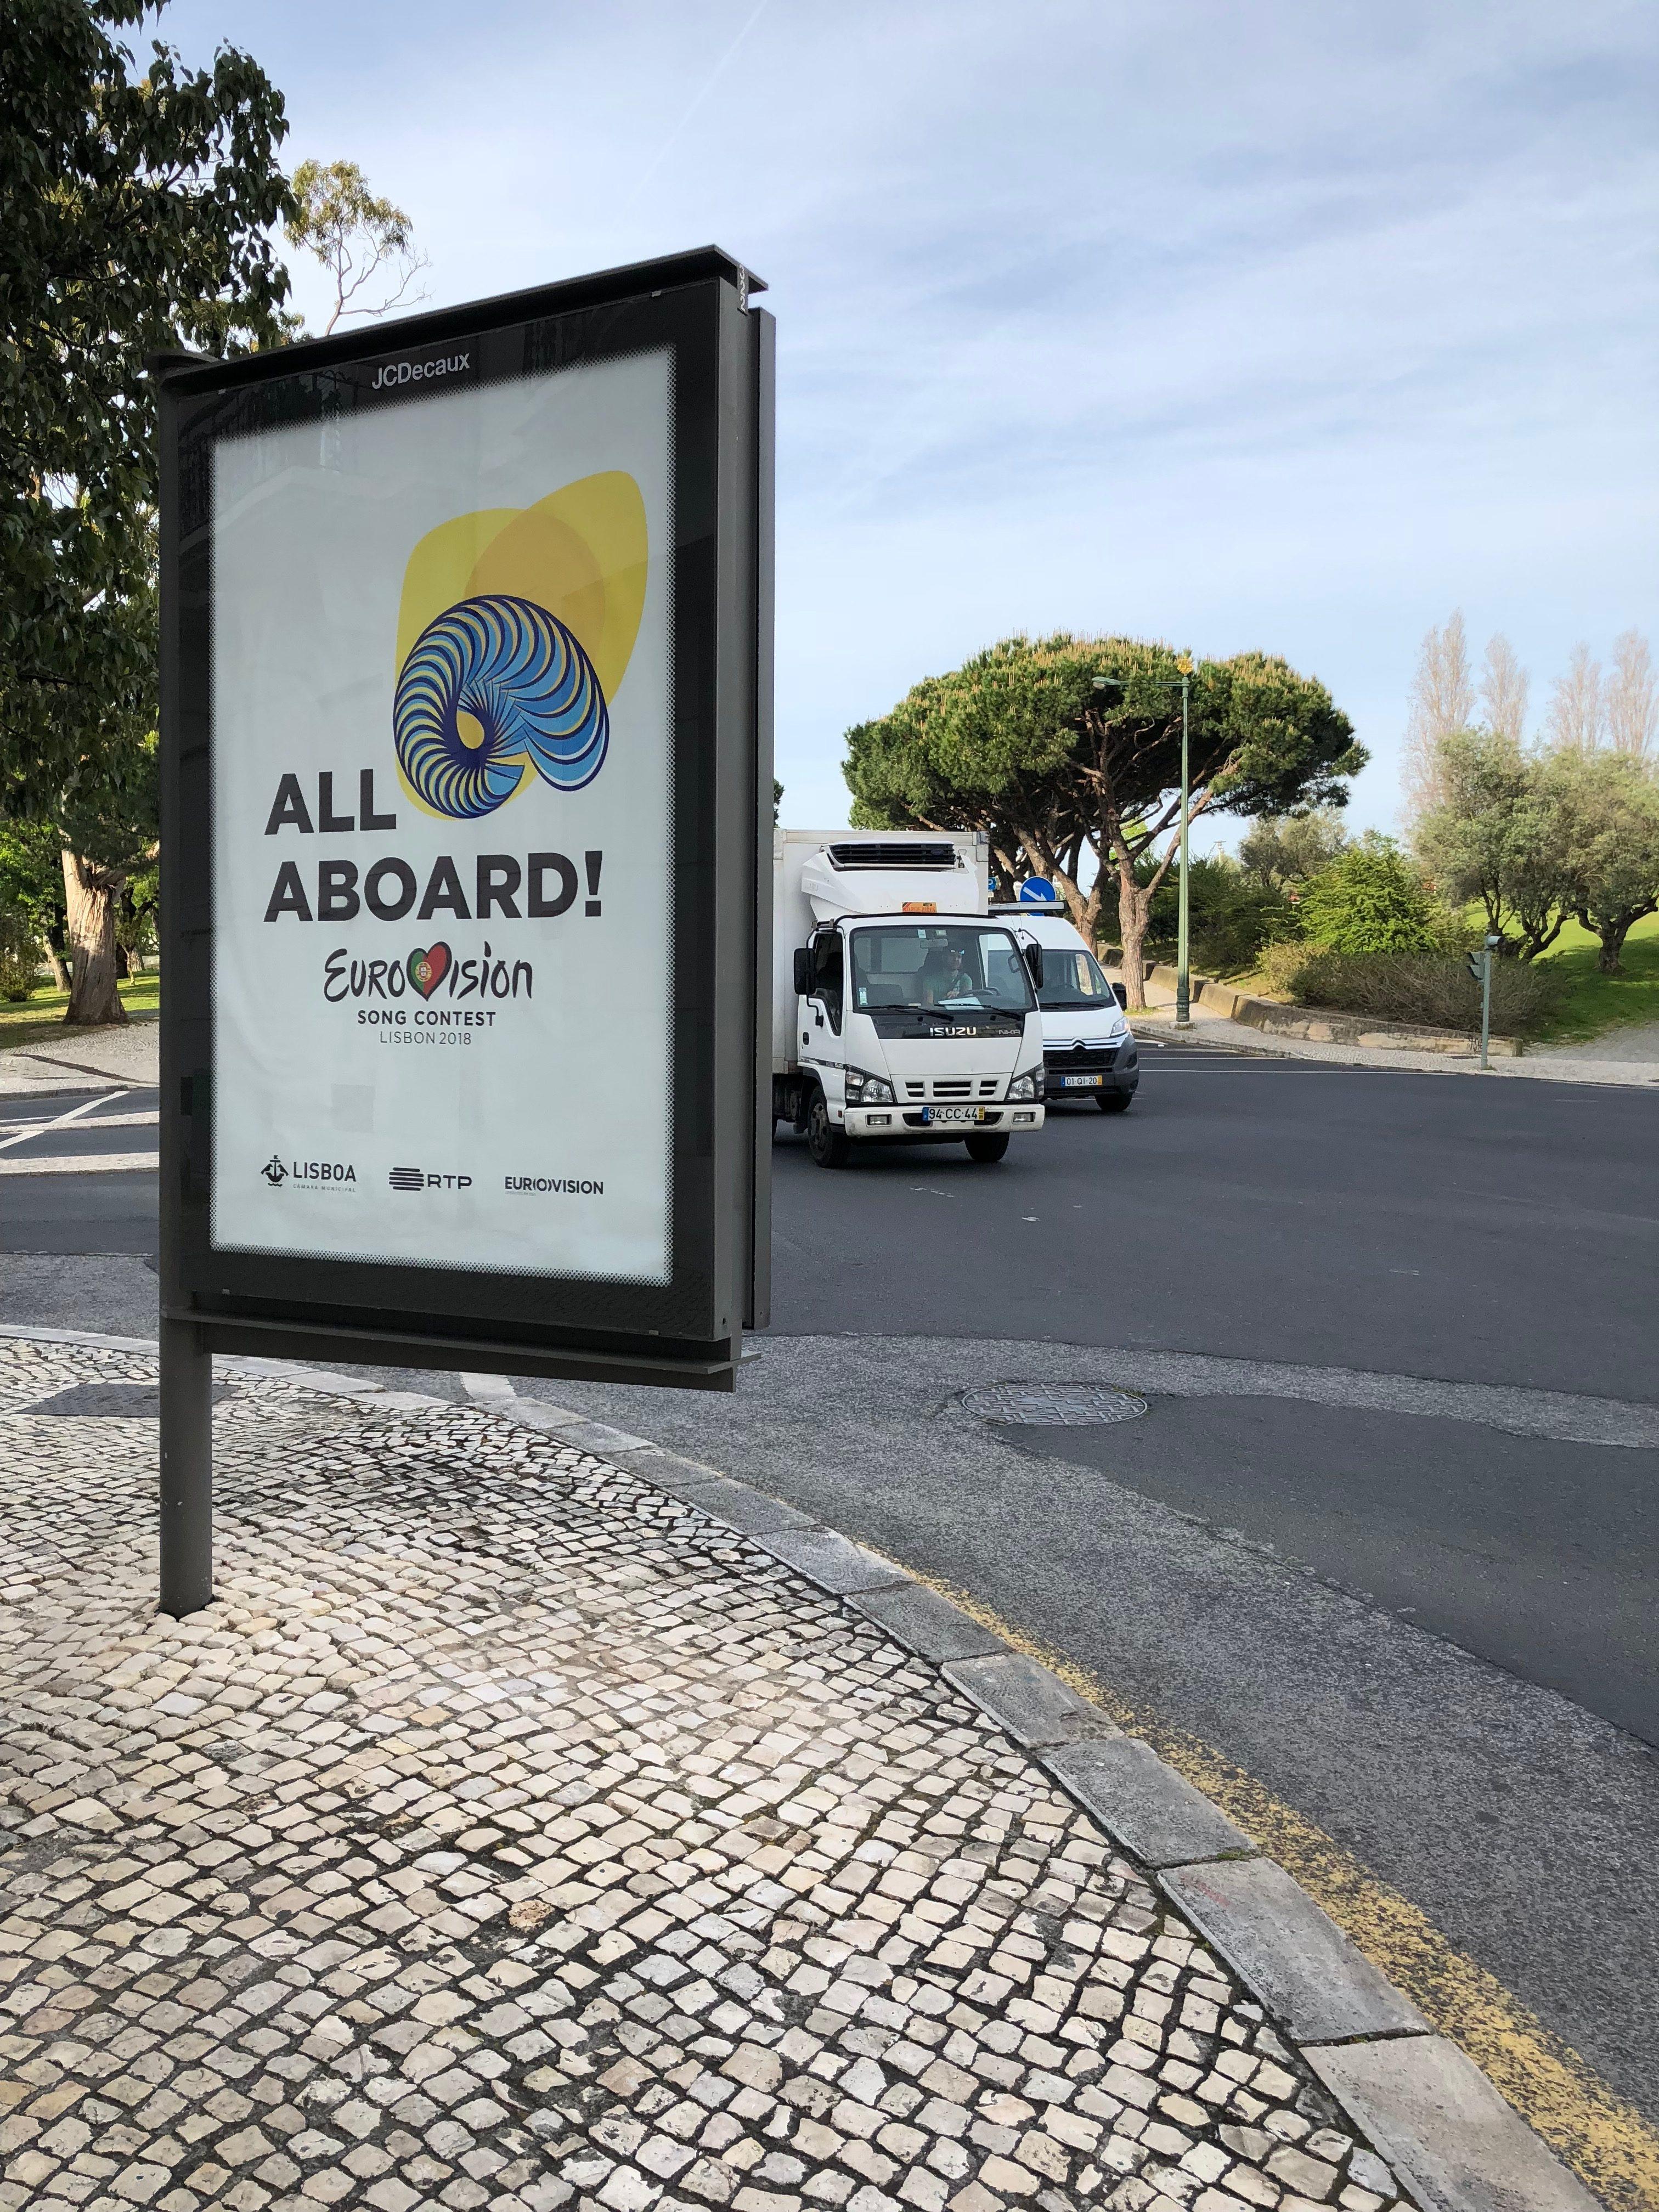 ליסבון 2018 האירוויזיון